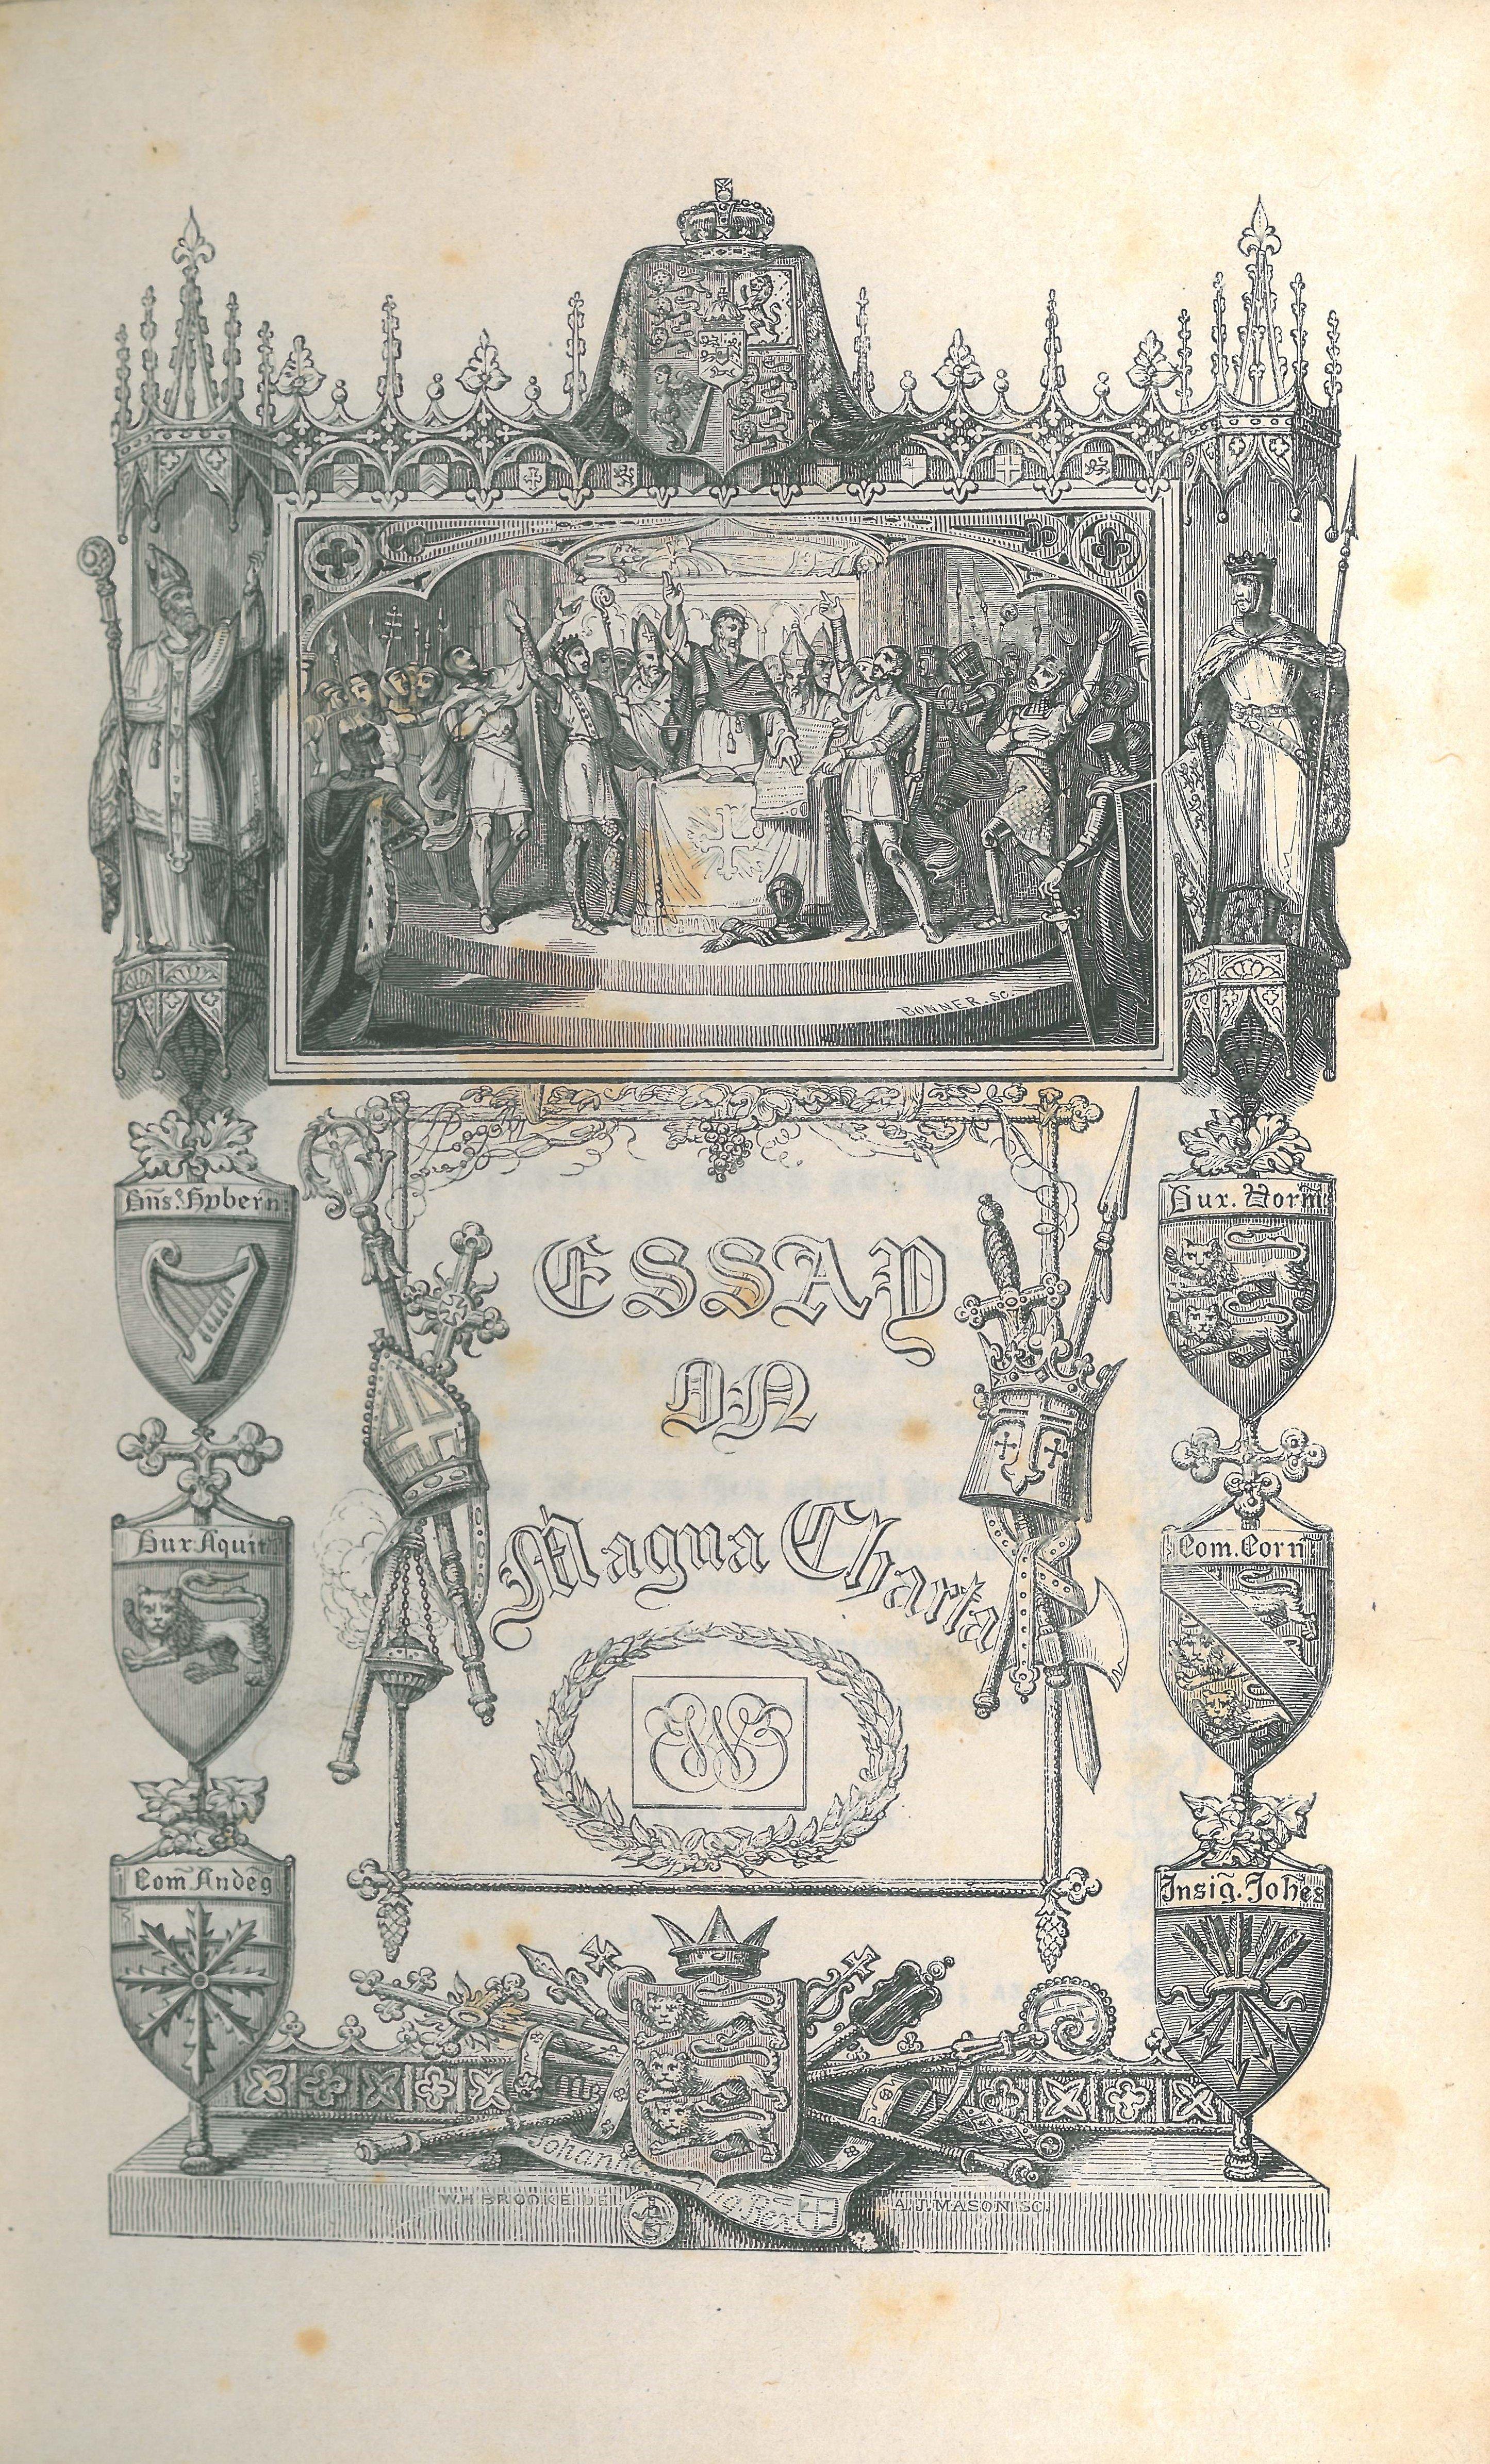 Frankenstein and society essay